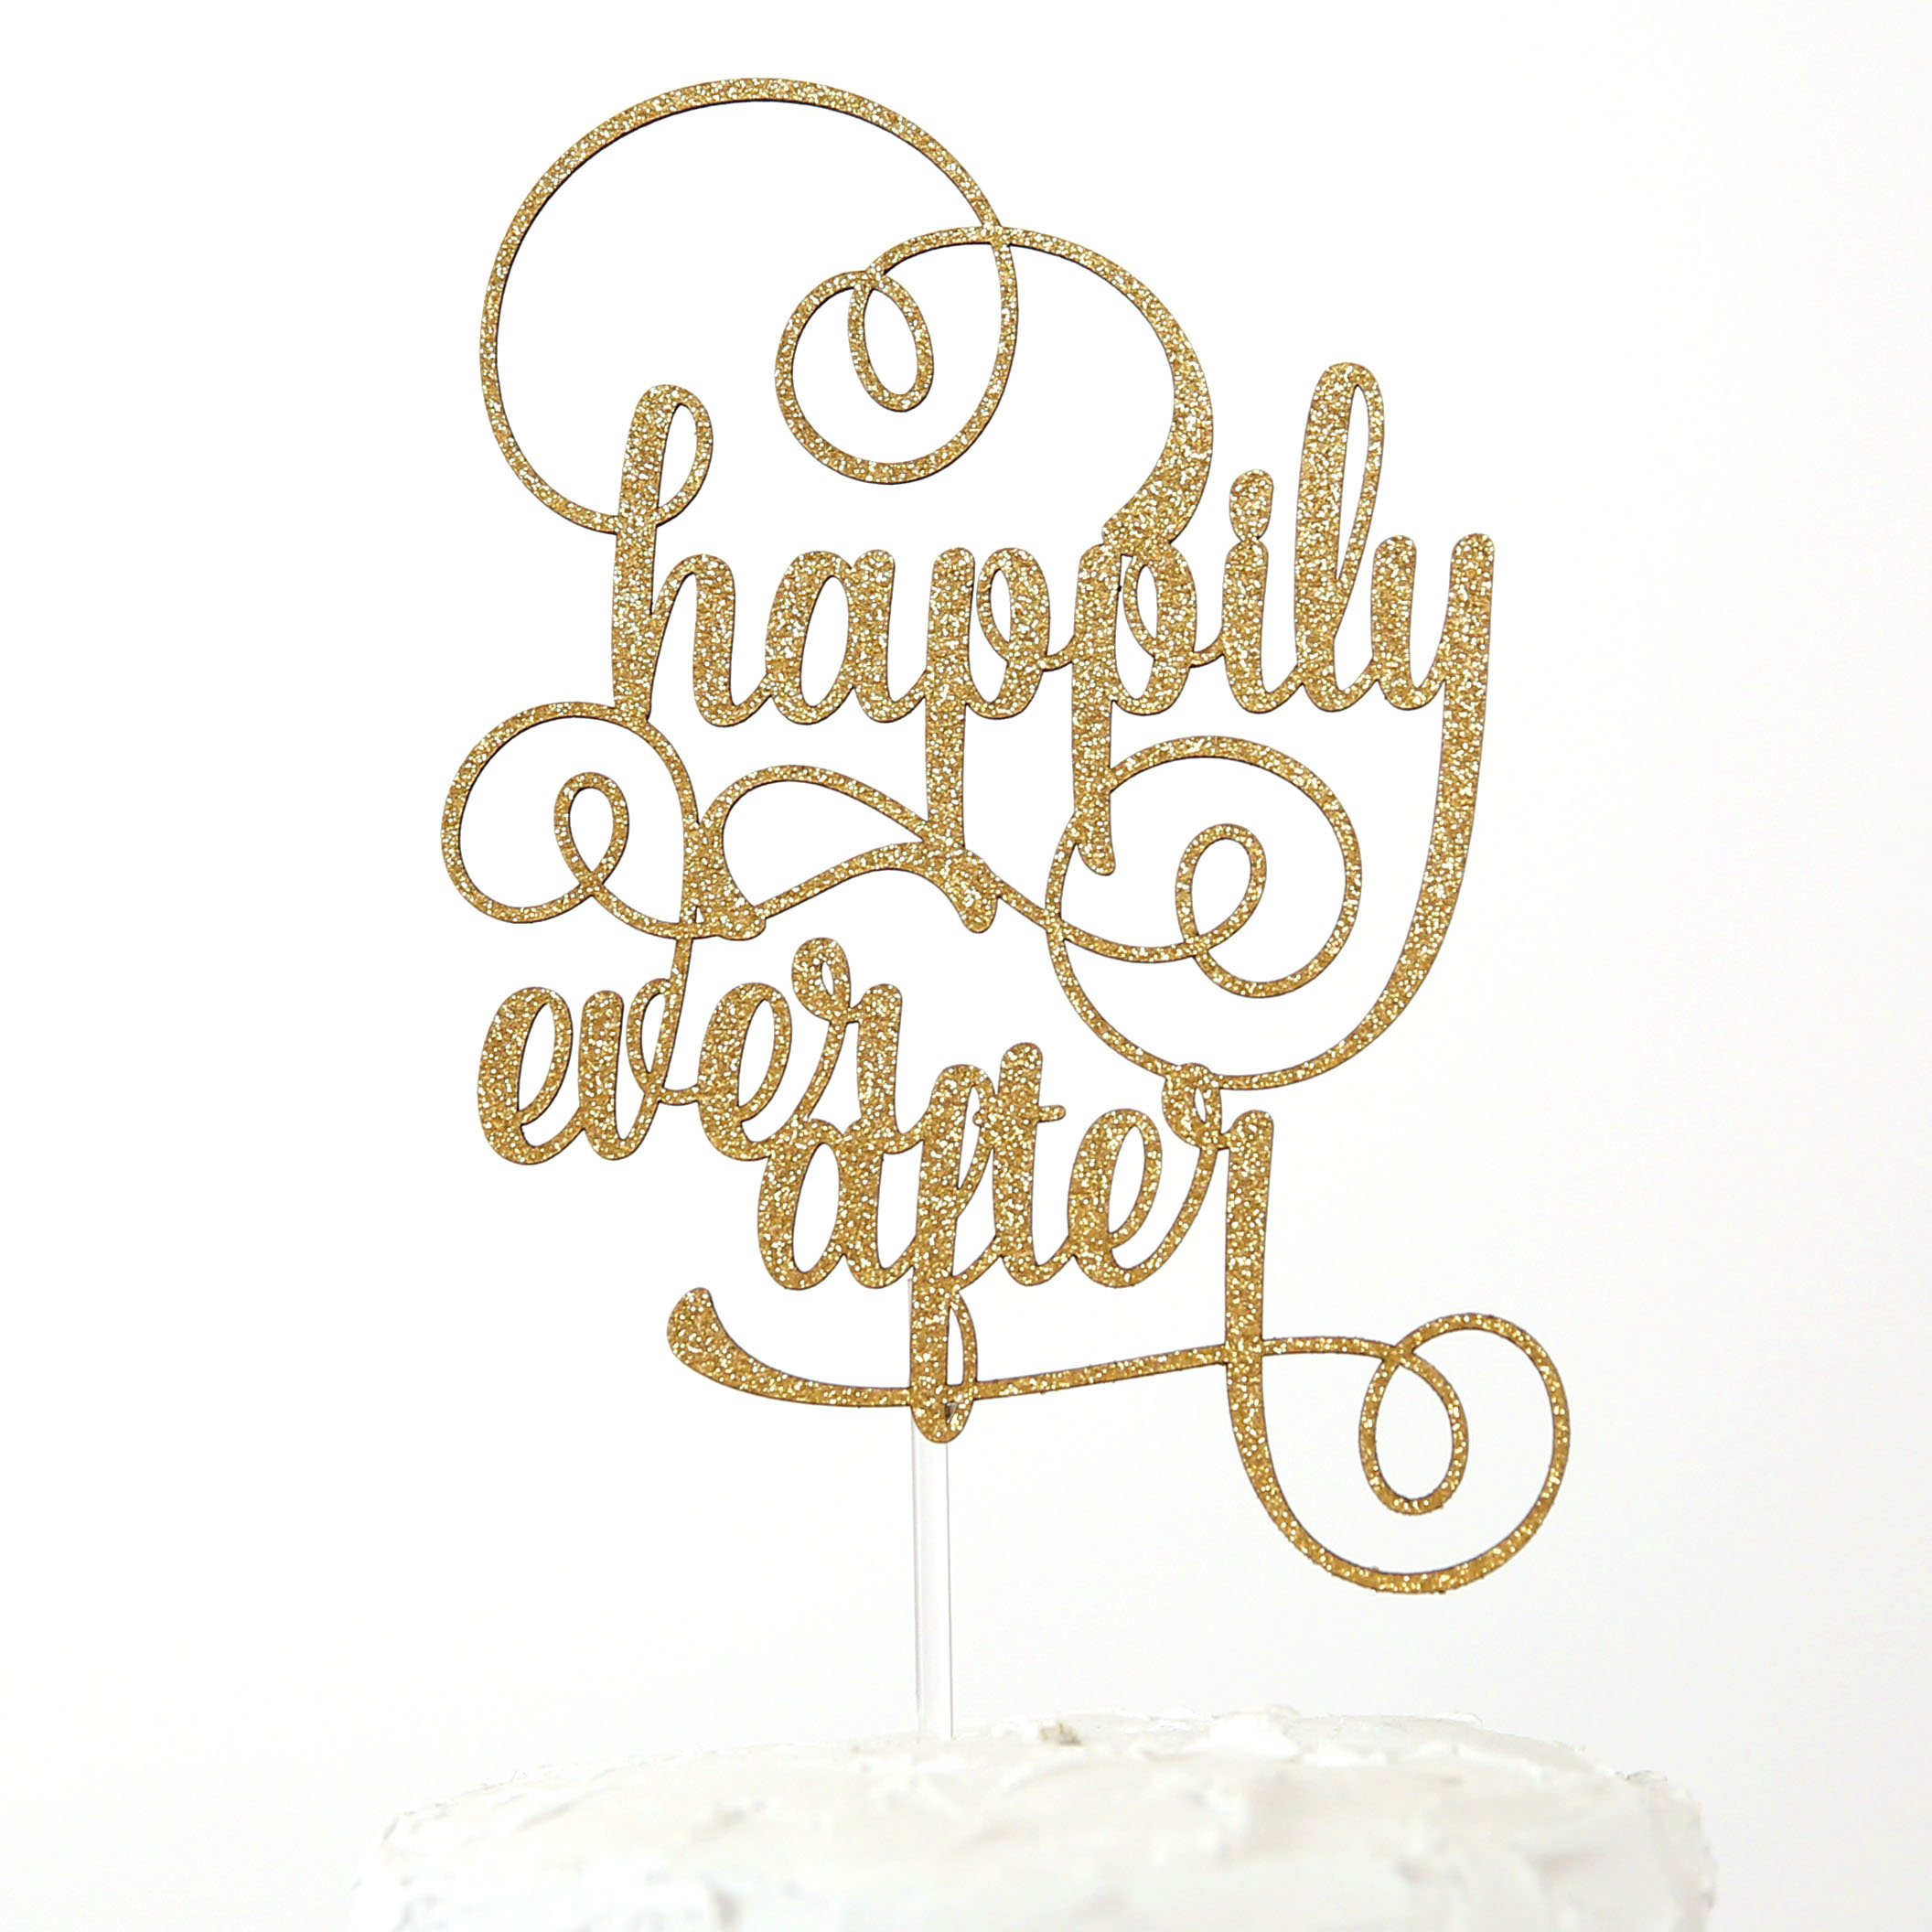 NANASUKO Wedding Cake Topper - happily ever after - Premium quality Made in USA by NANASUKO